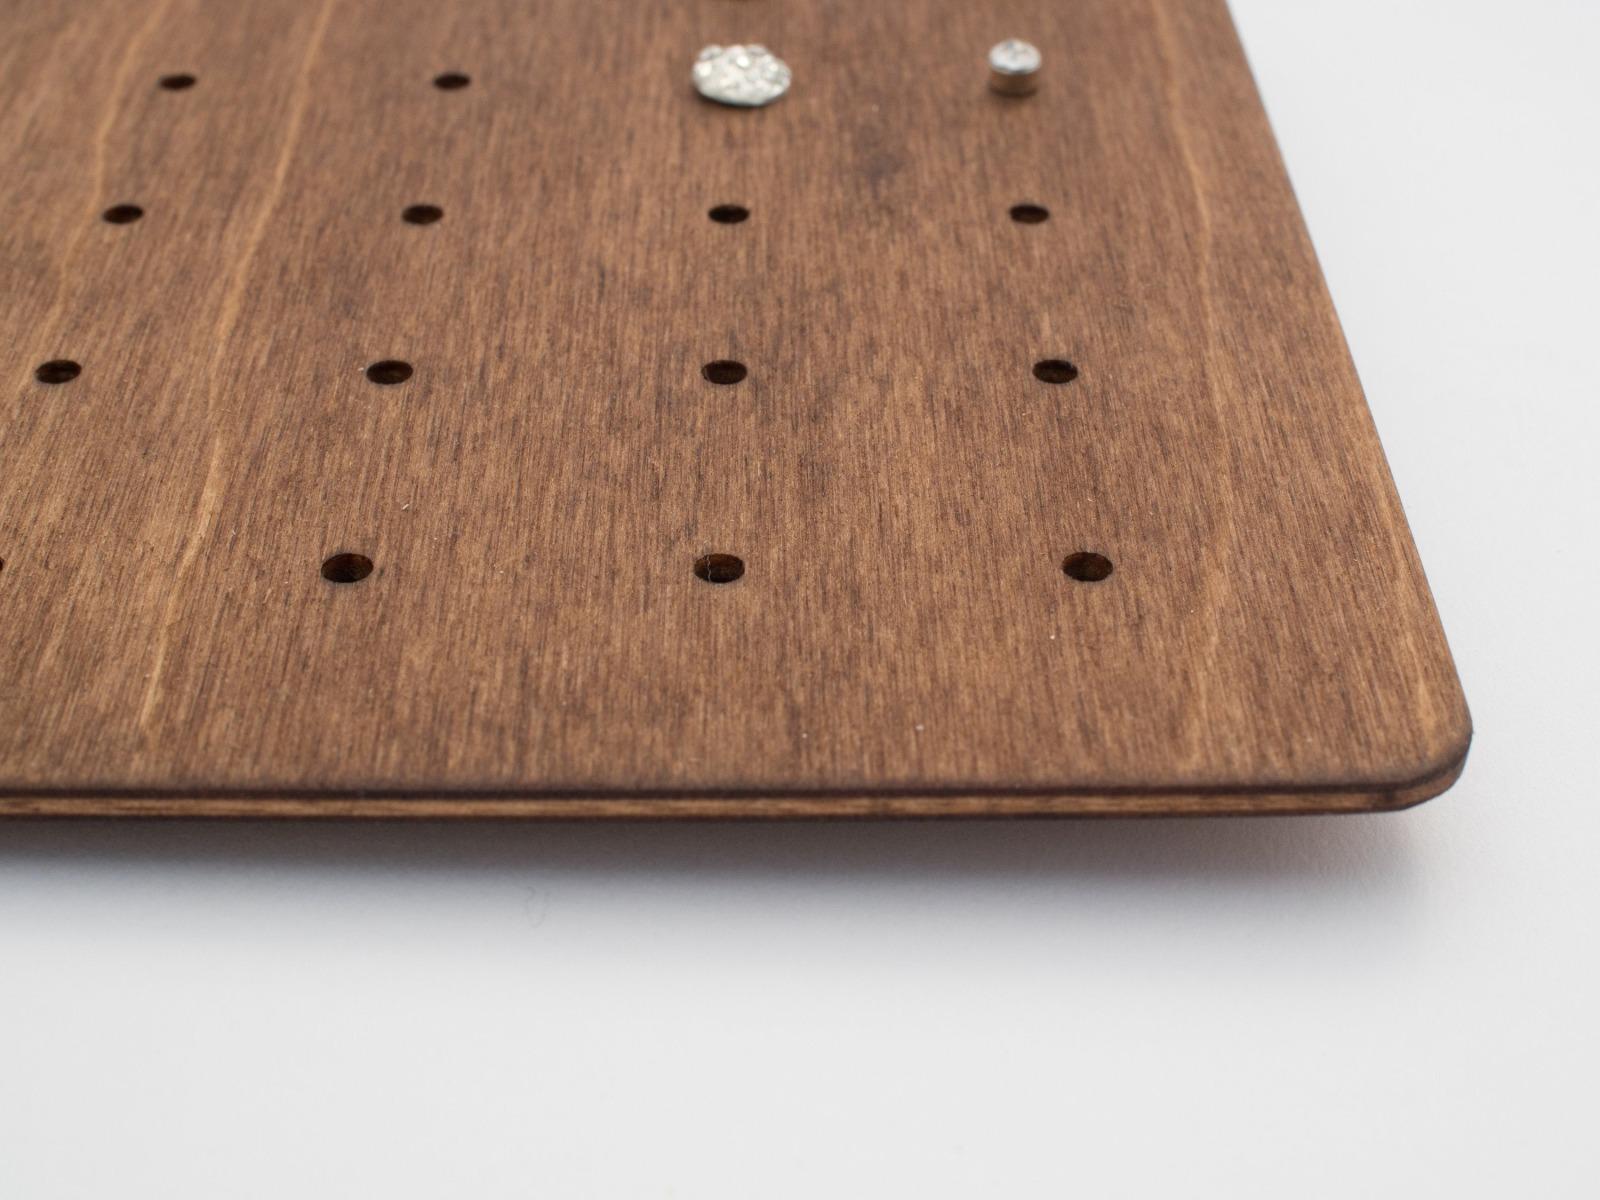 Modern Wooden Stud Earring Organizer CARD